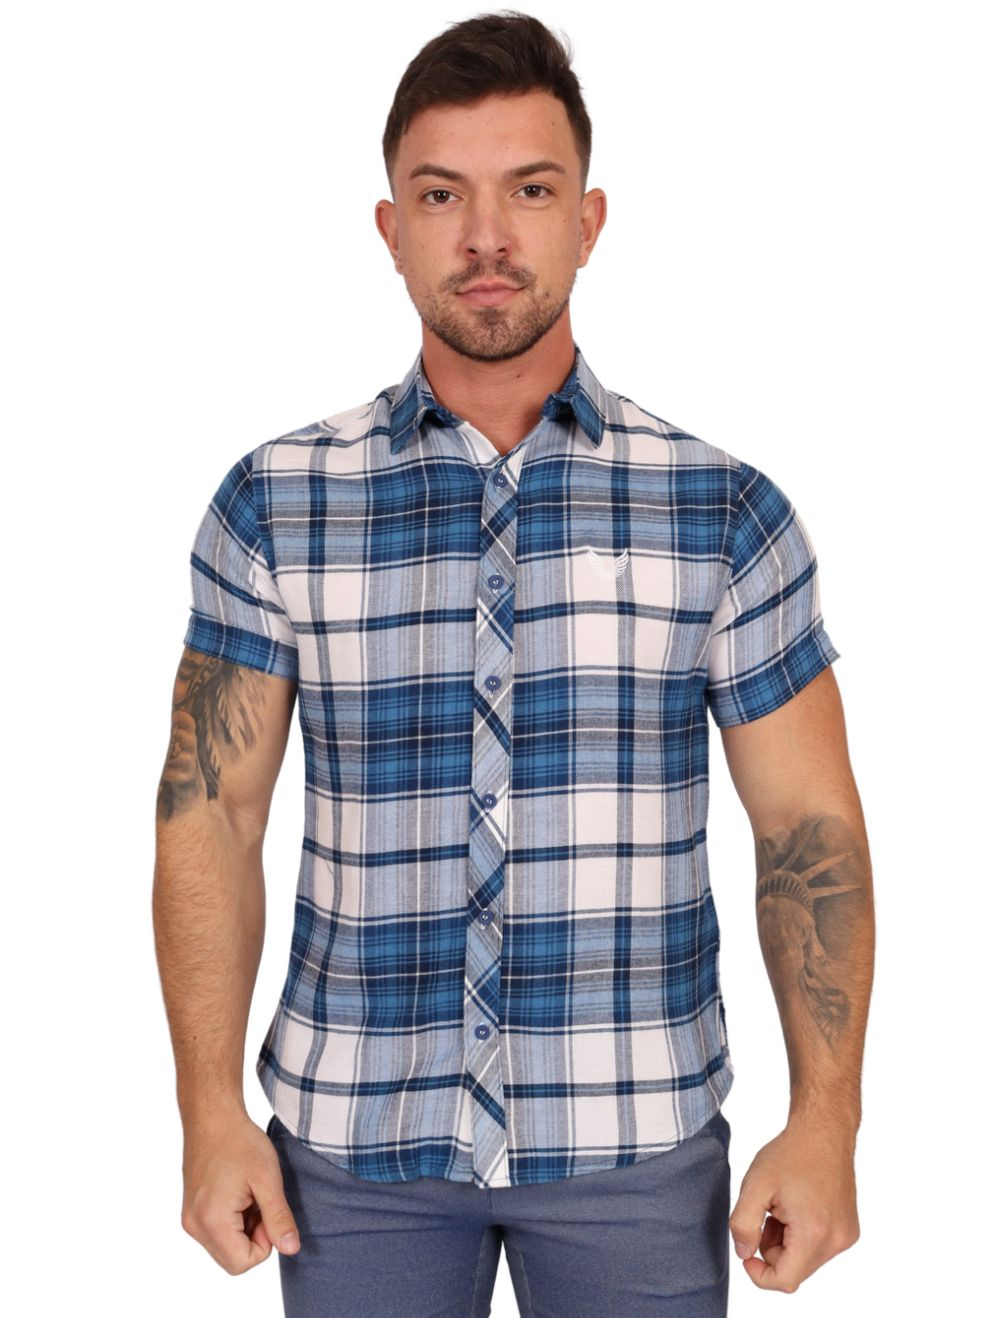 Camisa Masculina Manga Curta Xadrez Azul/Branco